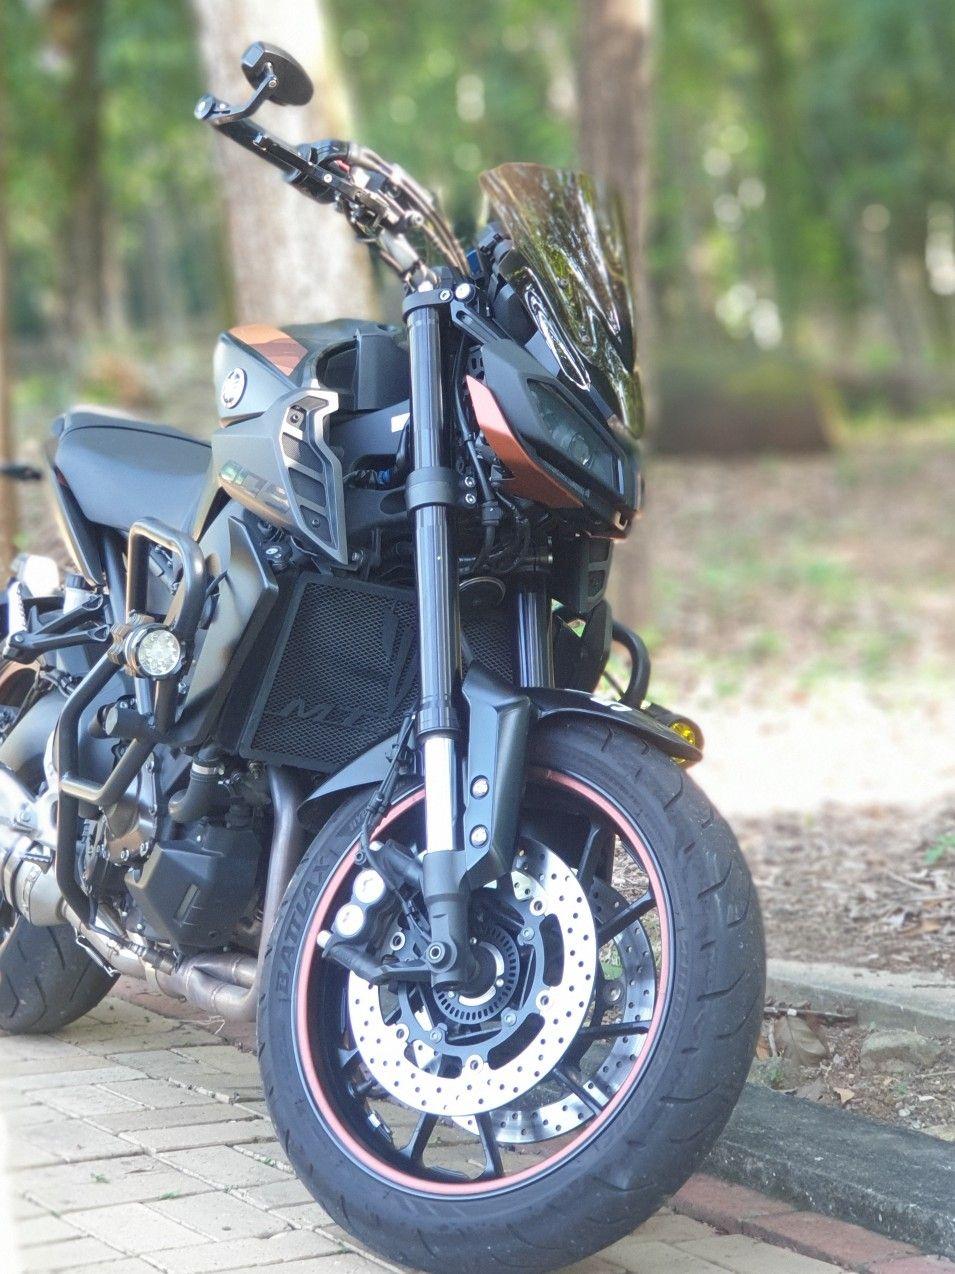 Pin on Yamaha MT-09 / FZ-09 / Naked Bikes